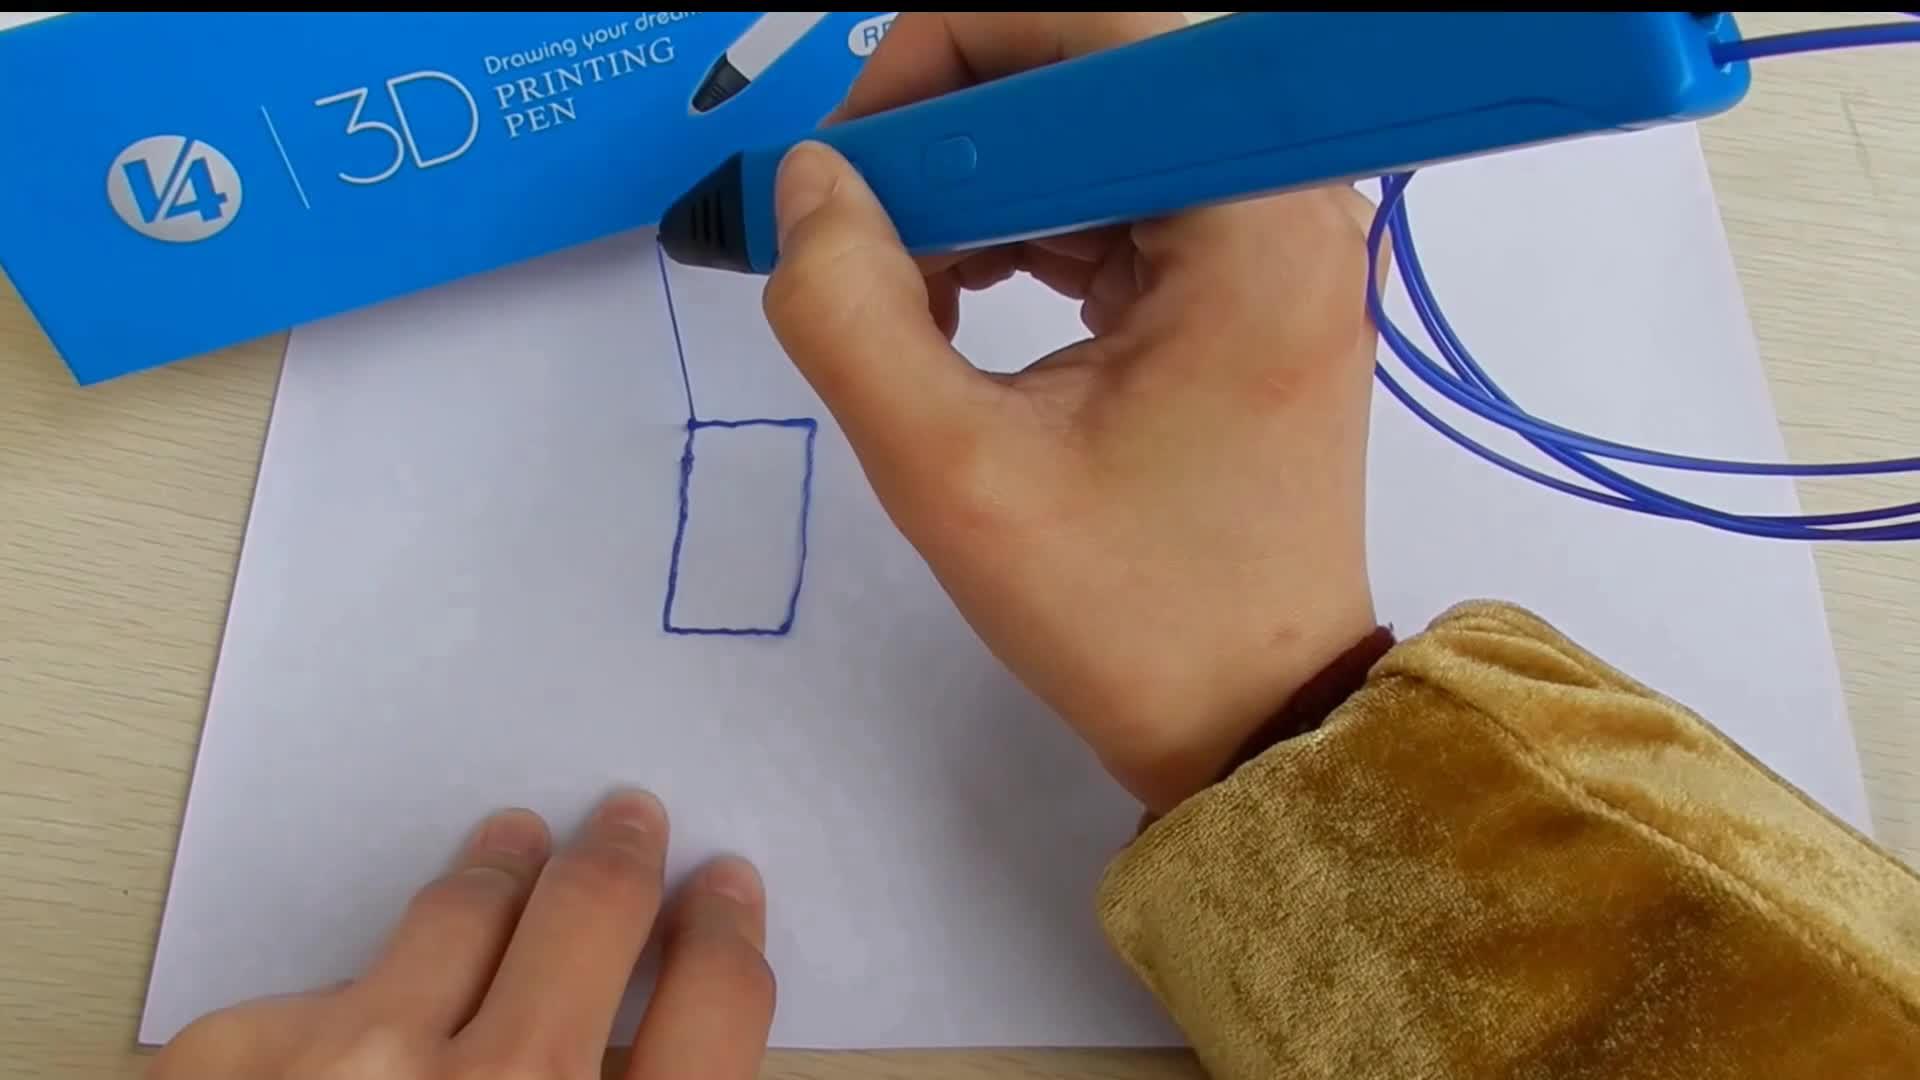 Wholesale Toys JER Educational 3D Printer Drawing Pen 3D Painting Pen For Kids